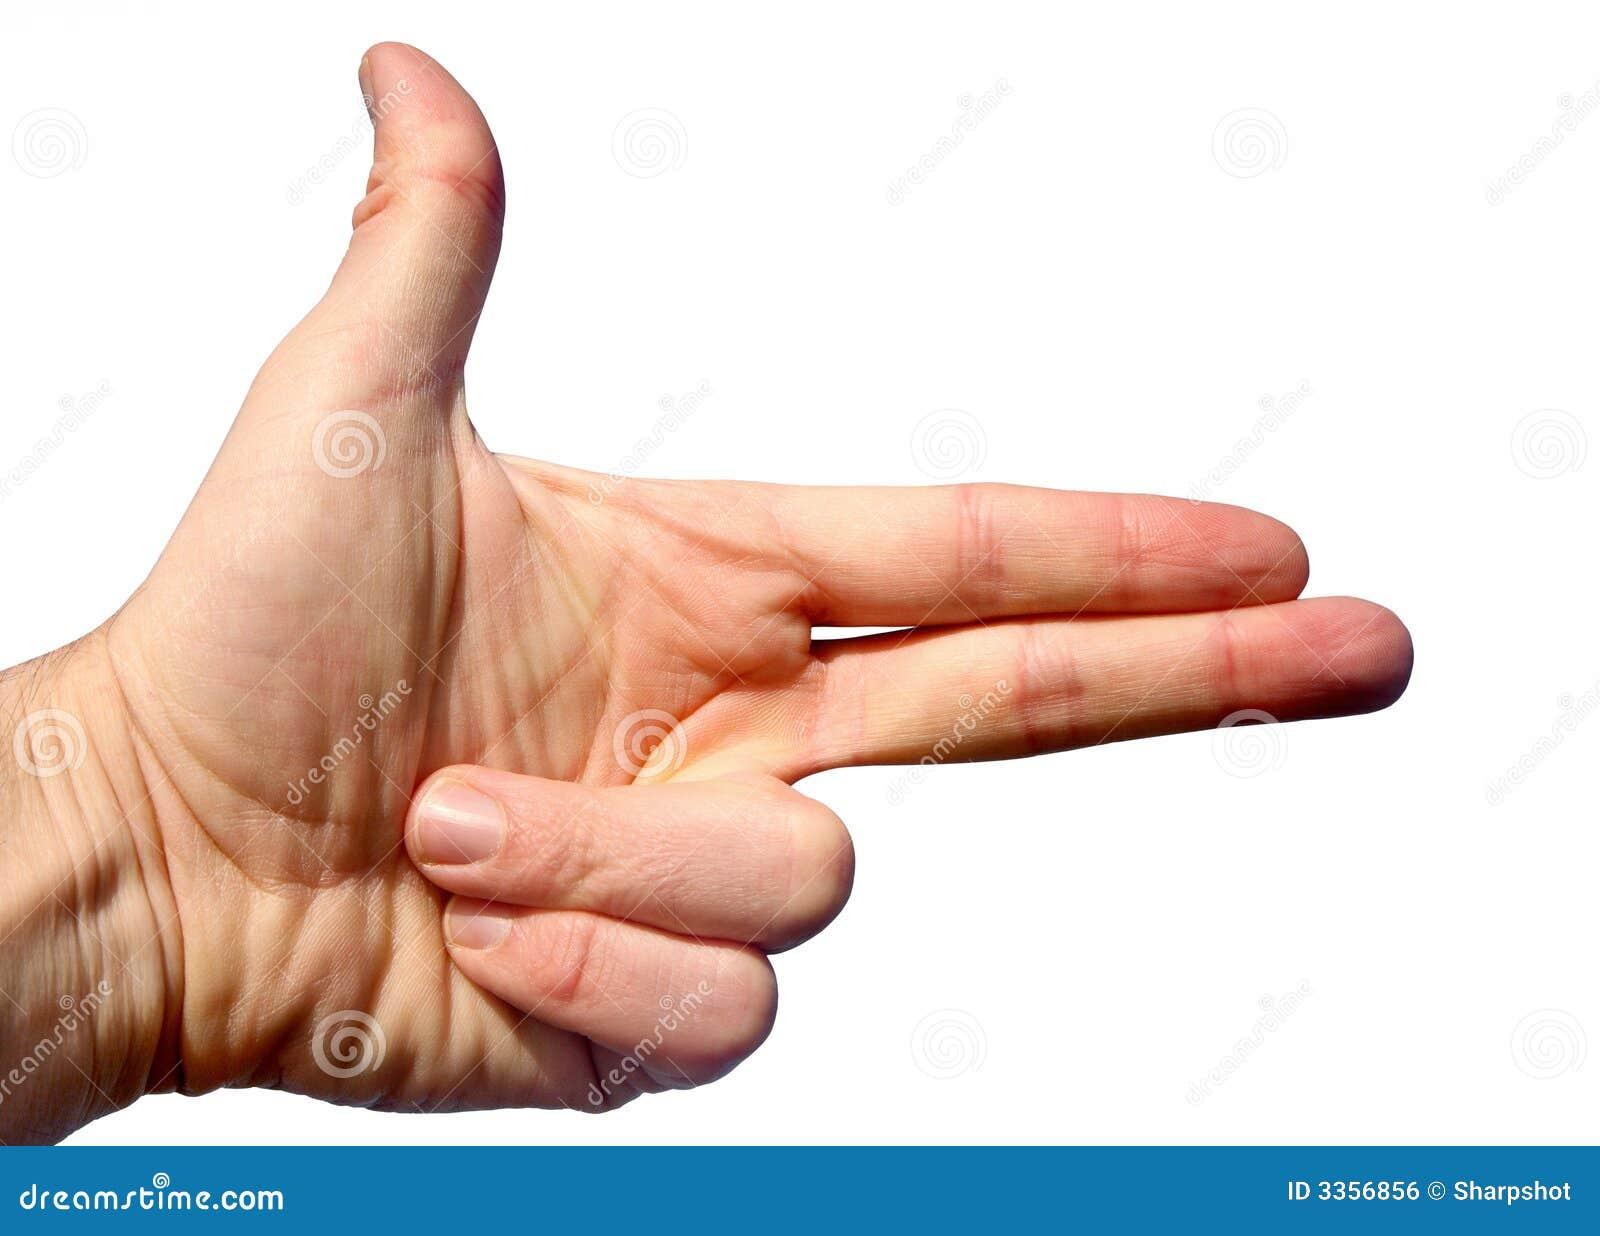 Gun hand hole left thumb